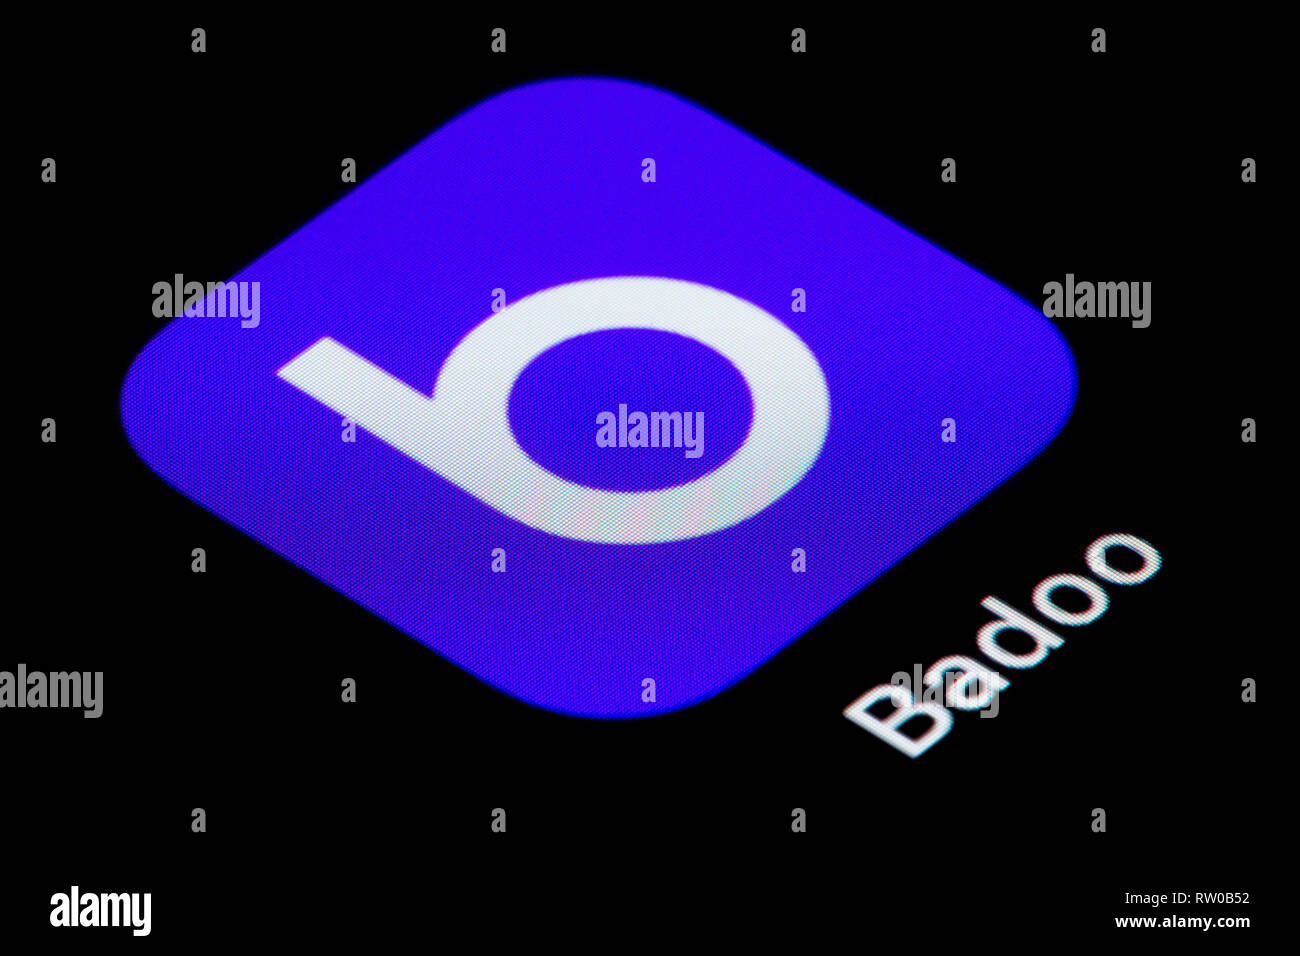 Badoo app download free  Badoo Premium Free: Download Badoo